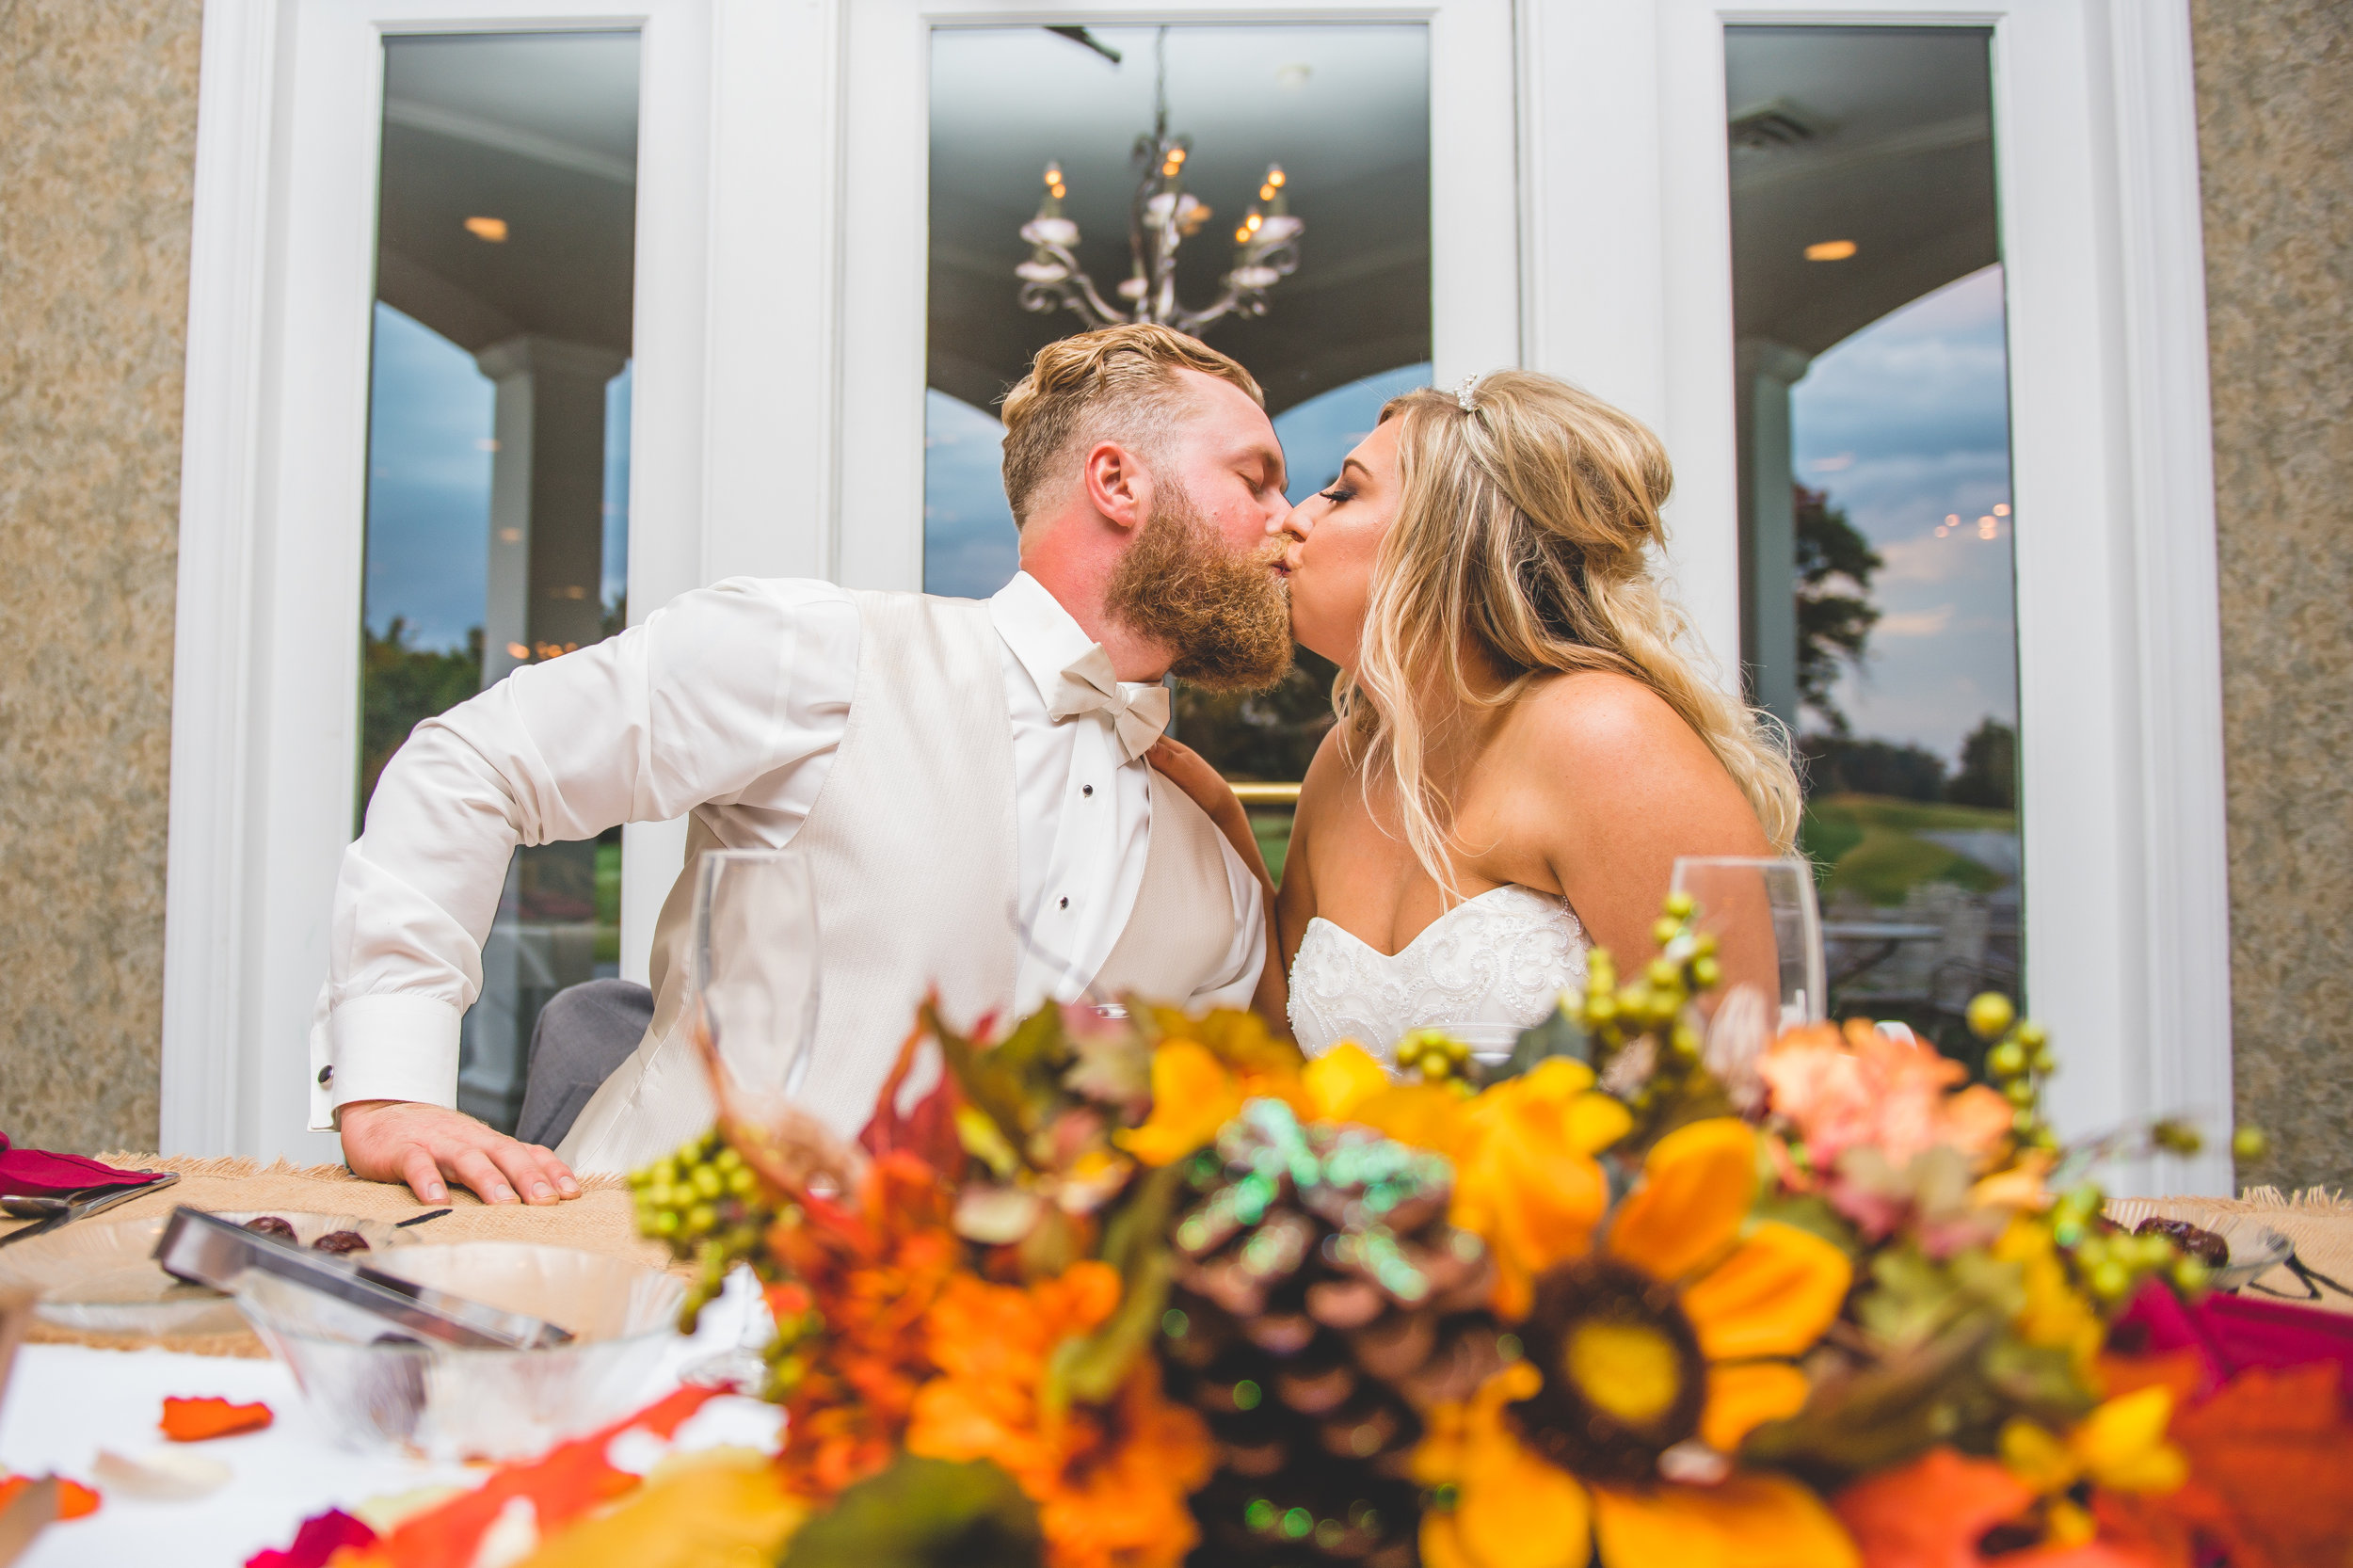 CCW - Creative Cure Weddings - Marissa and Nick - Southern Illinois Wedding Photography-10.jpg